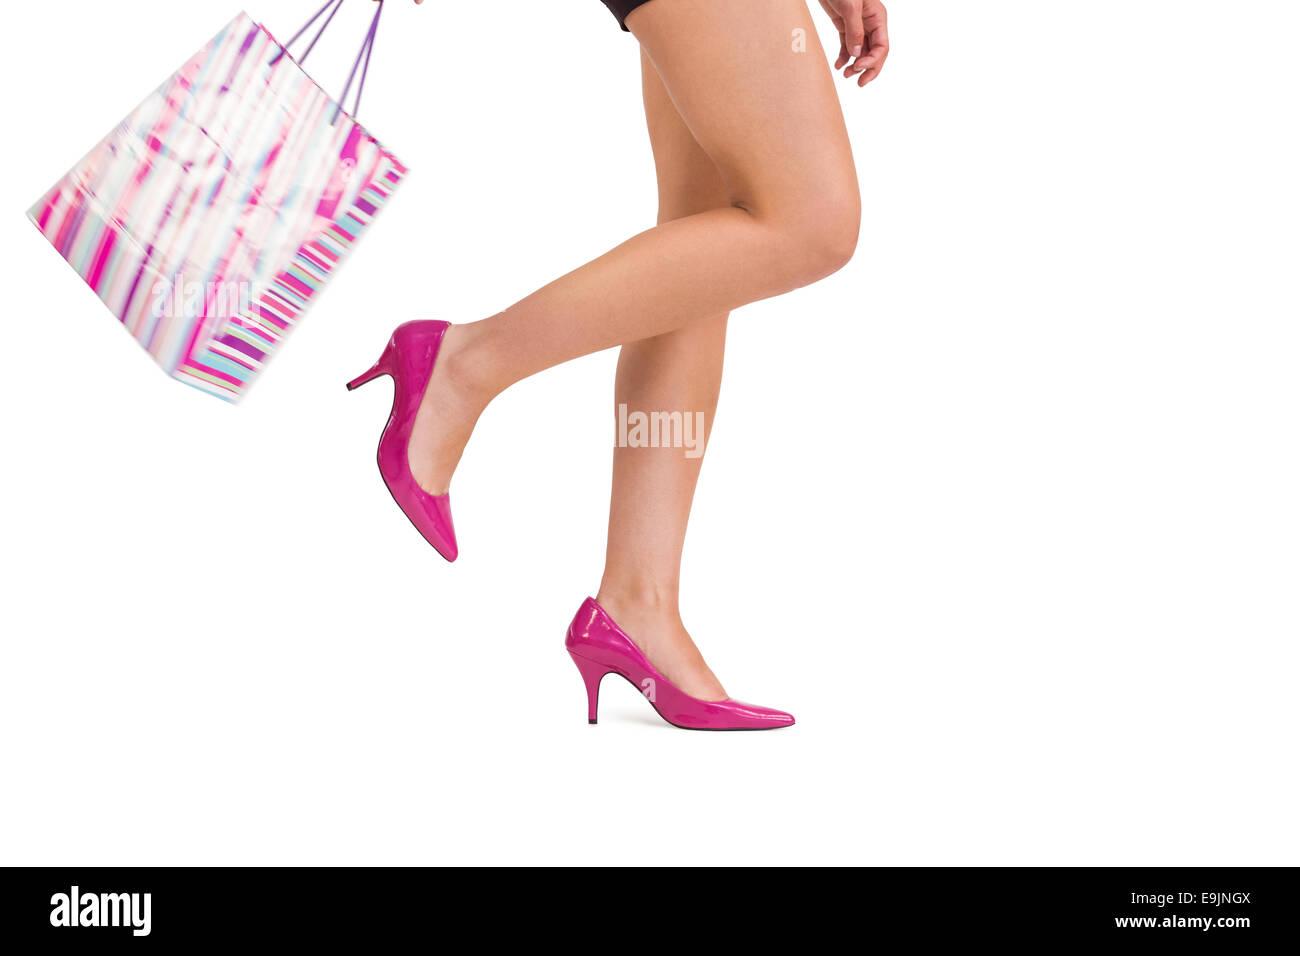 Womans legs in high heels - Stock Image